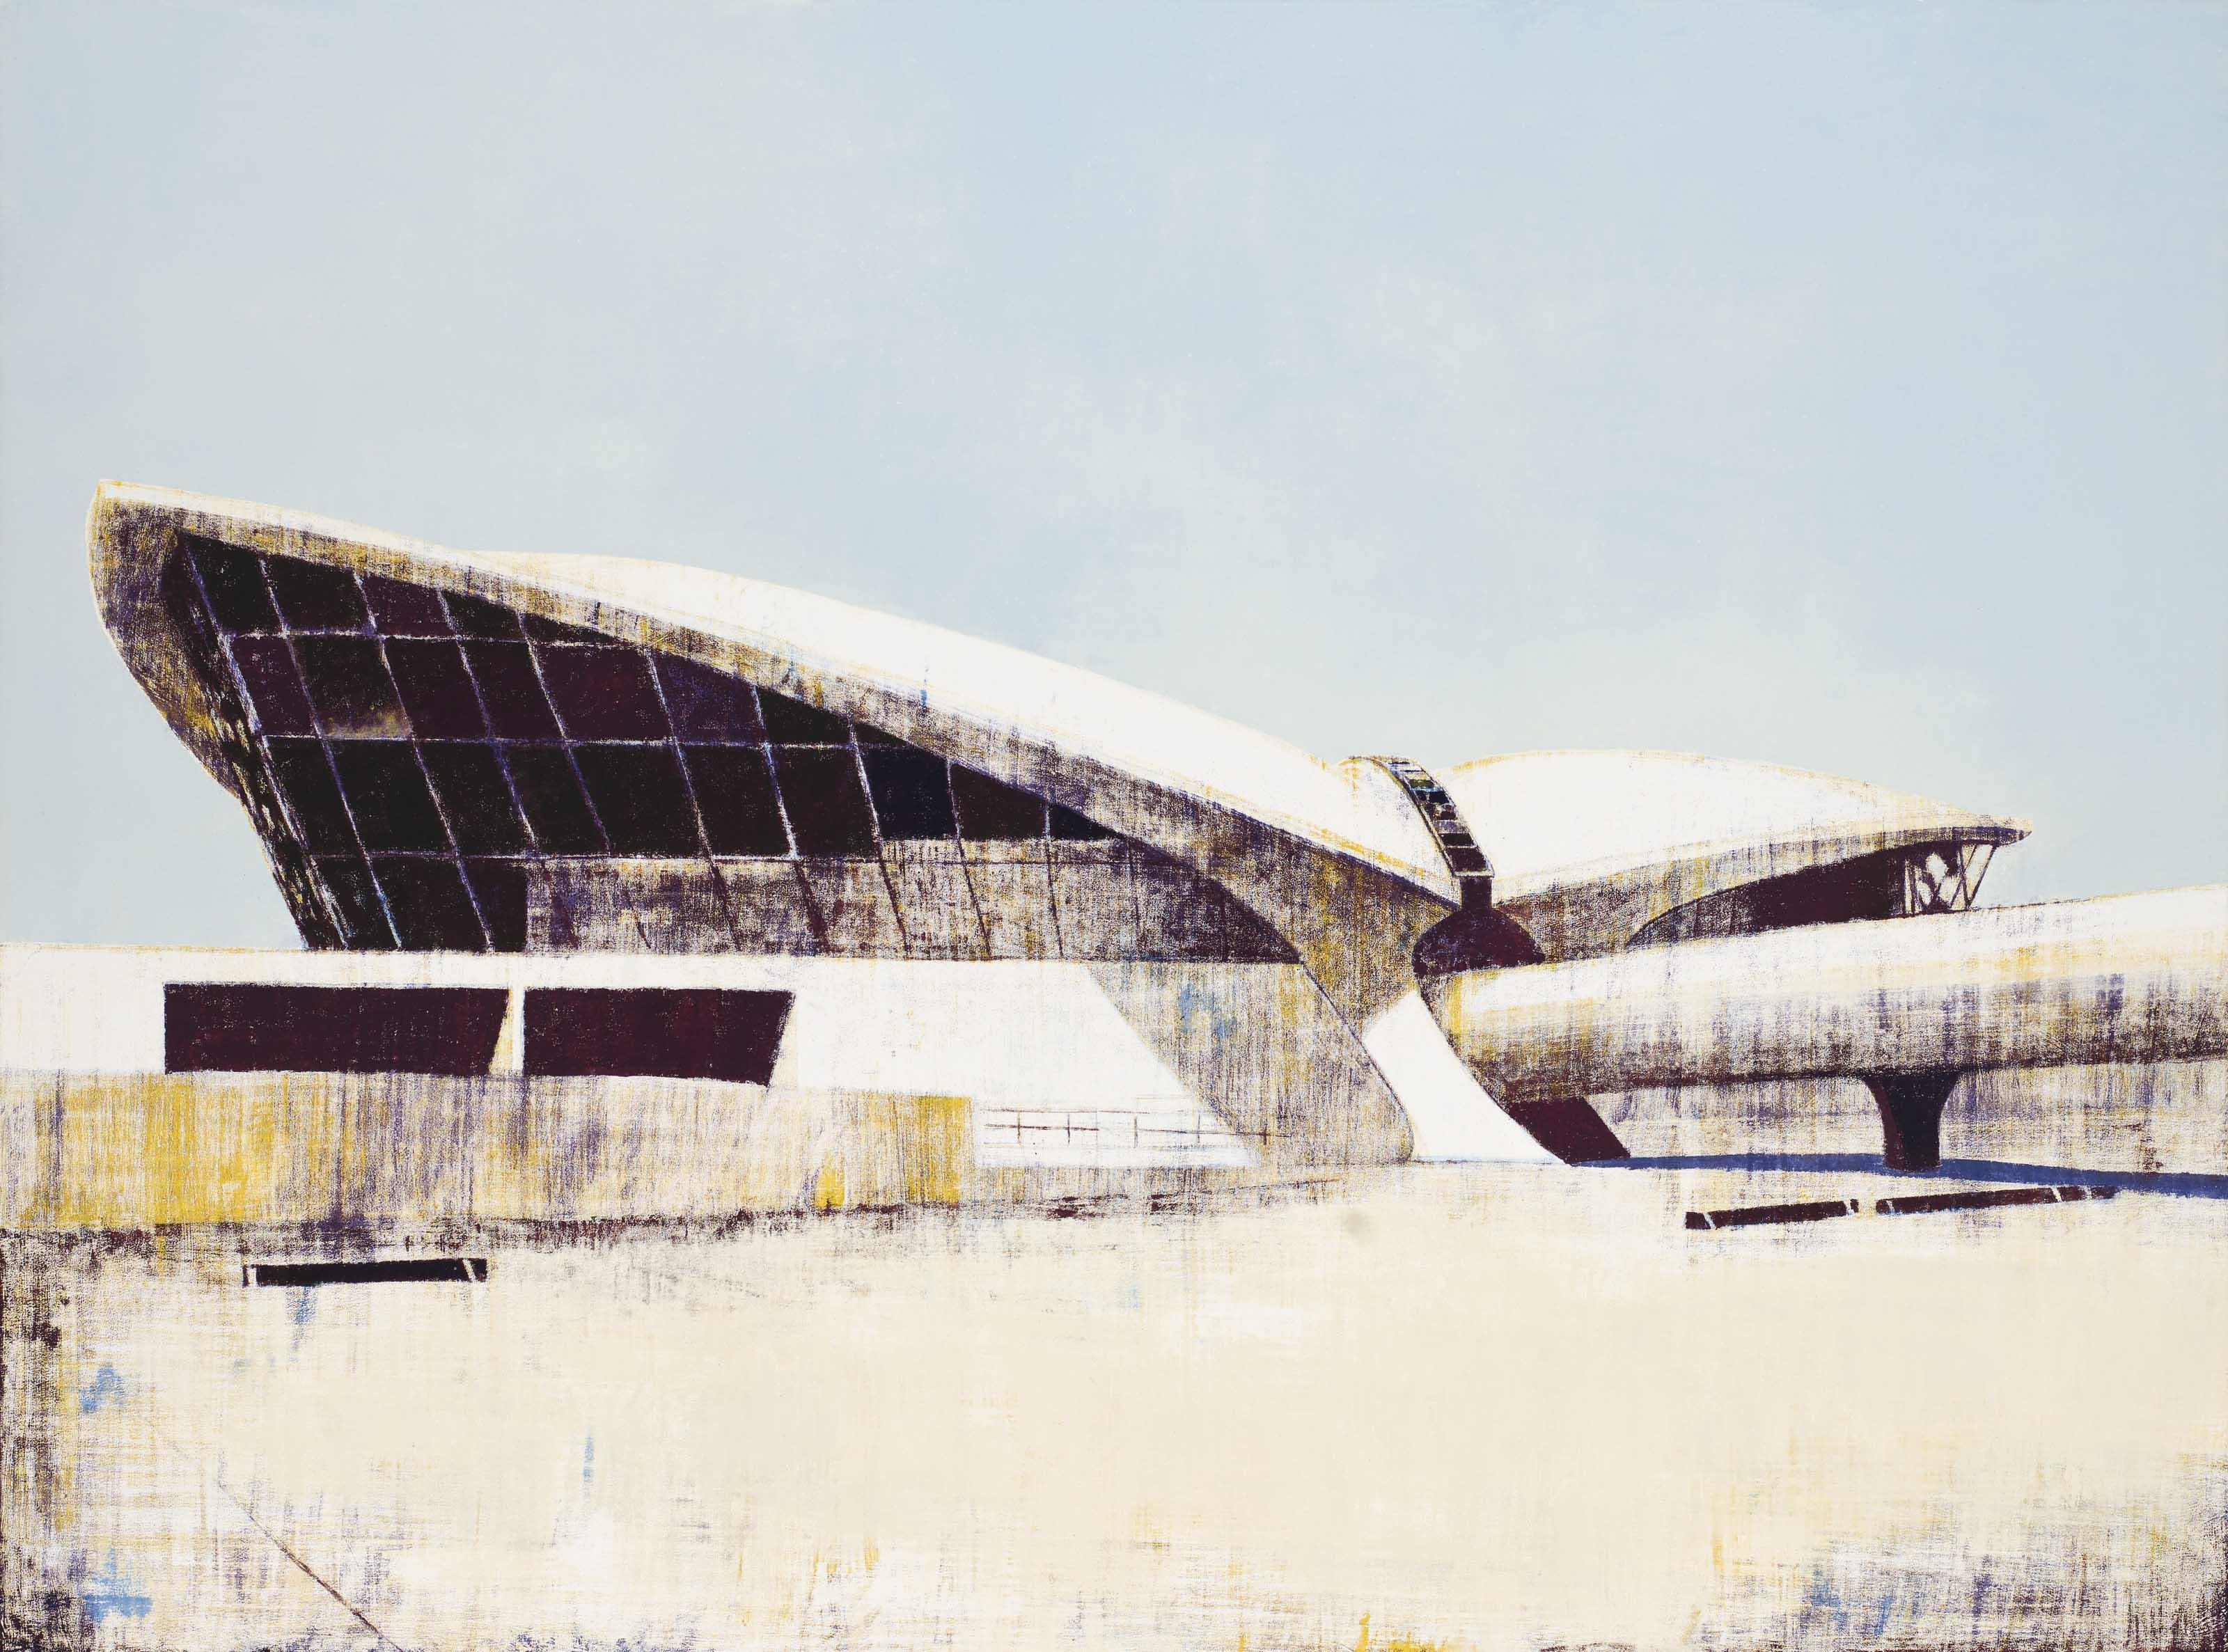 TWA Terminal, Kennedy Airport, New York